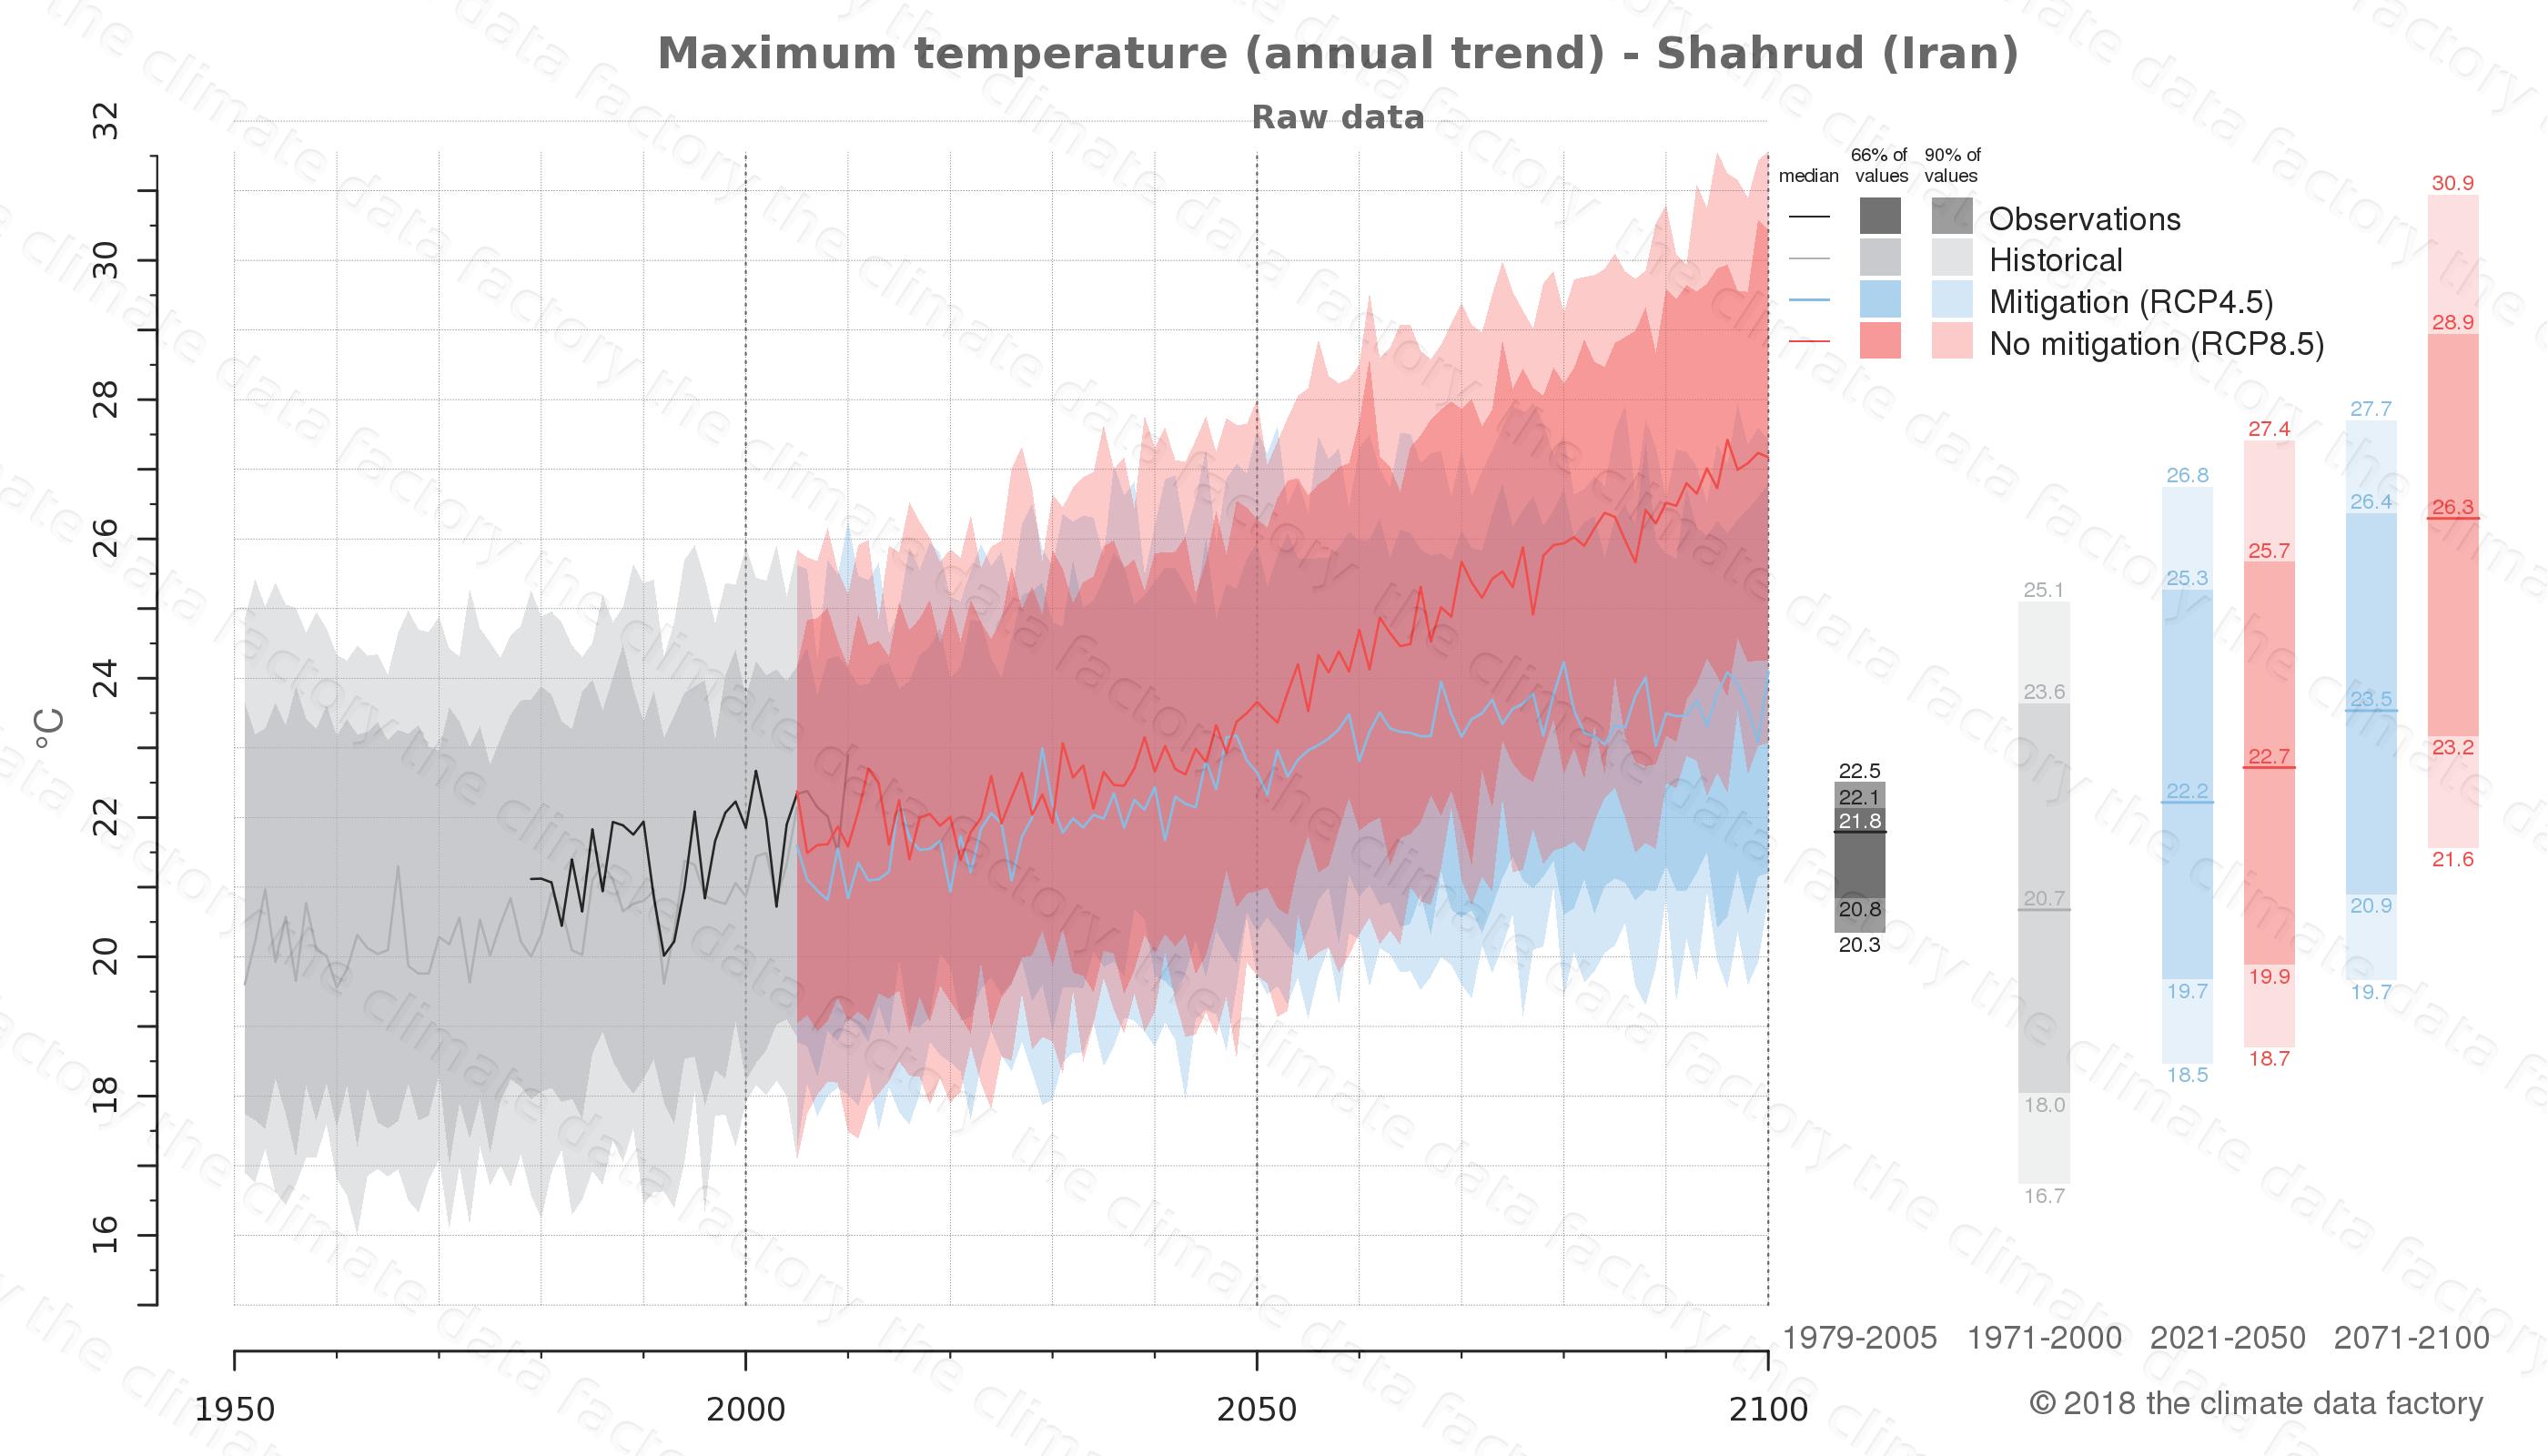 climate change data policy adaptation climate graph city data maximum-temperature shahrud iran